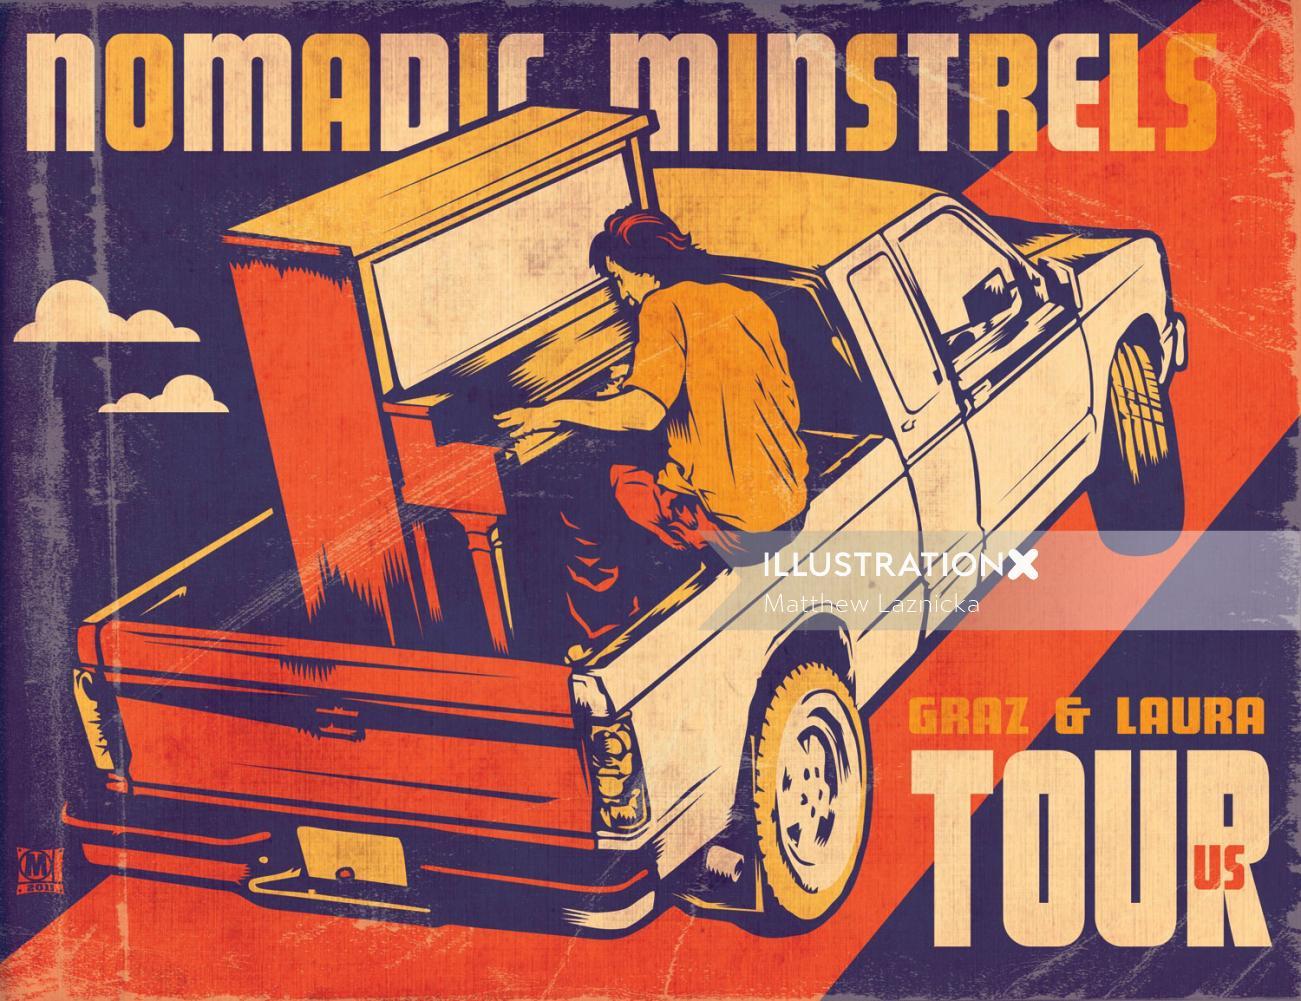 Retro Band poster